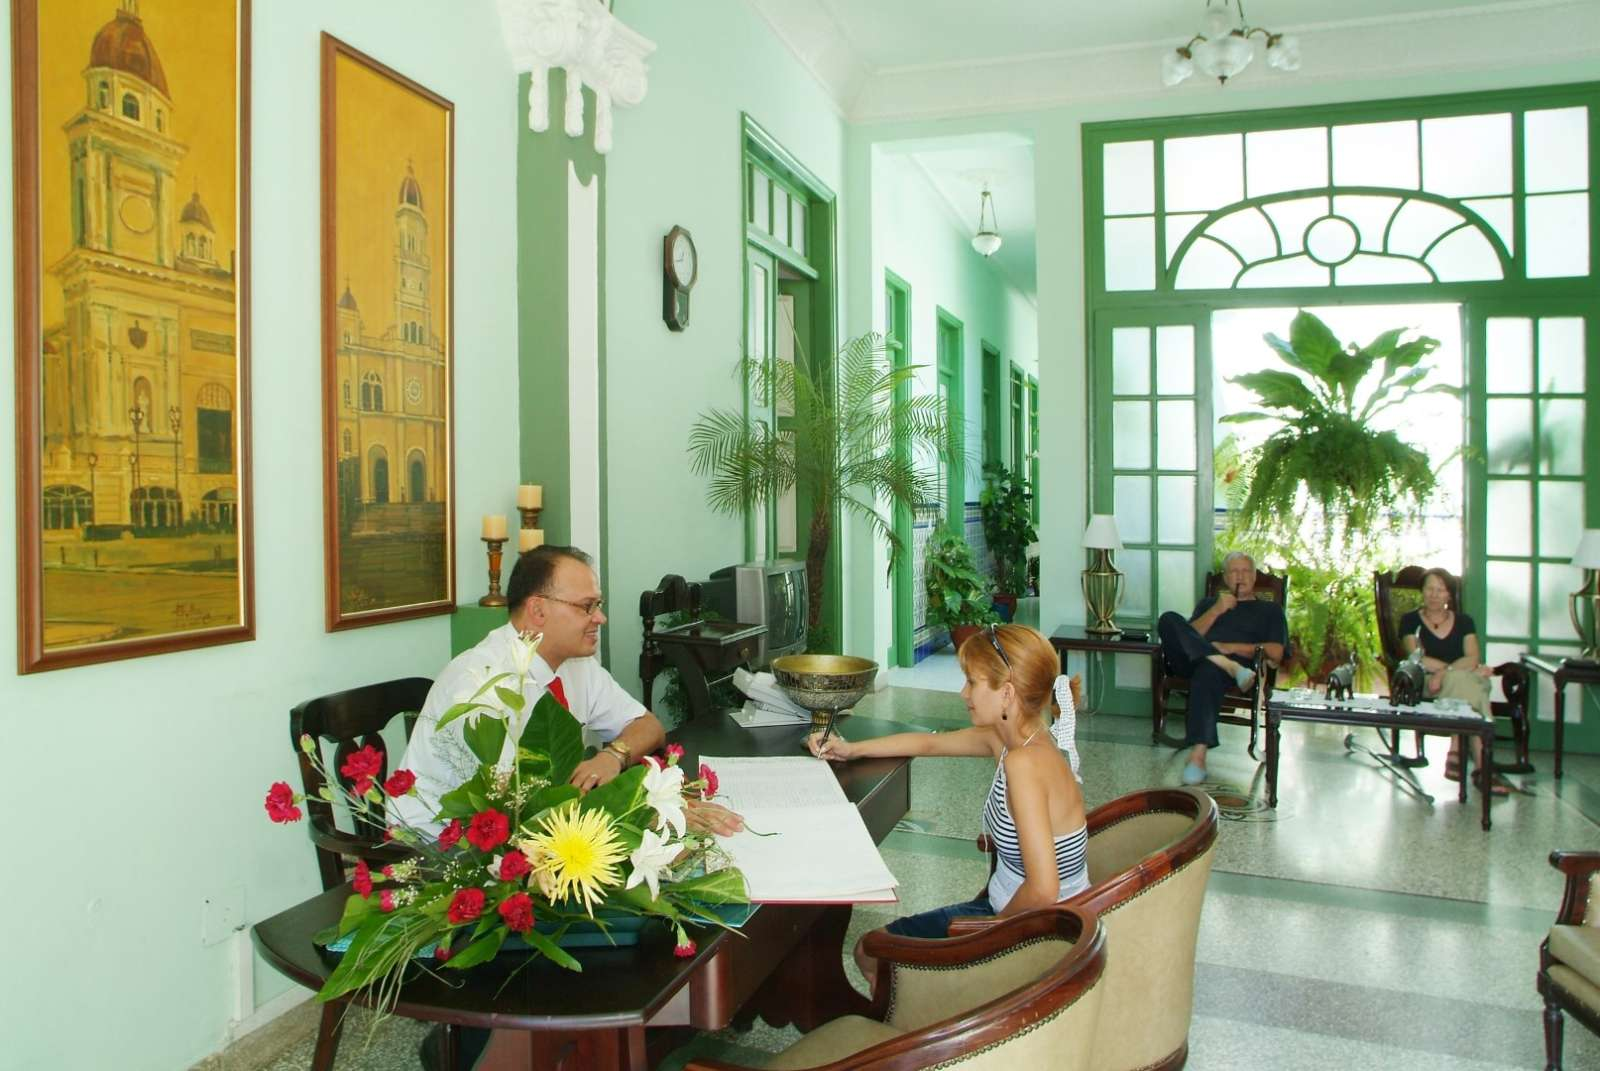 Reception at Hostal San Basilio